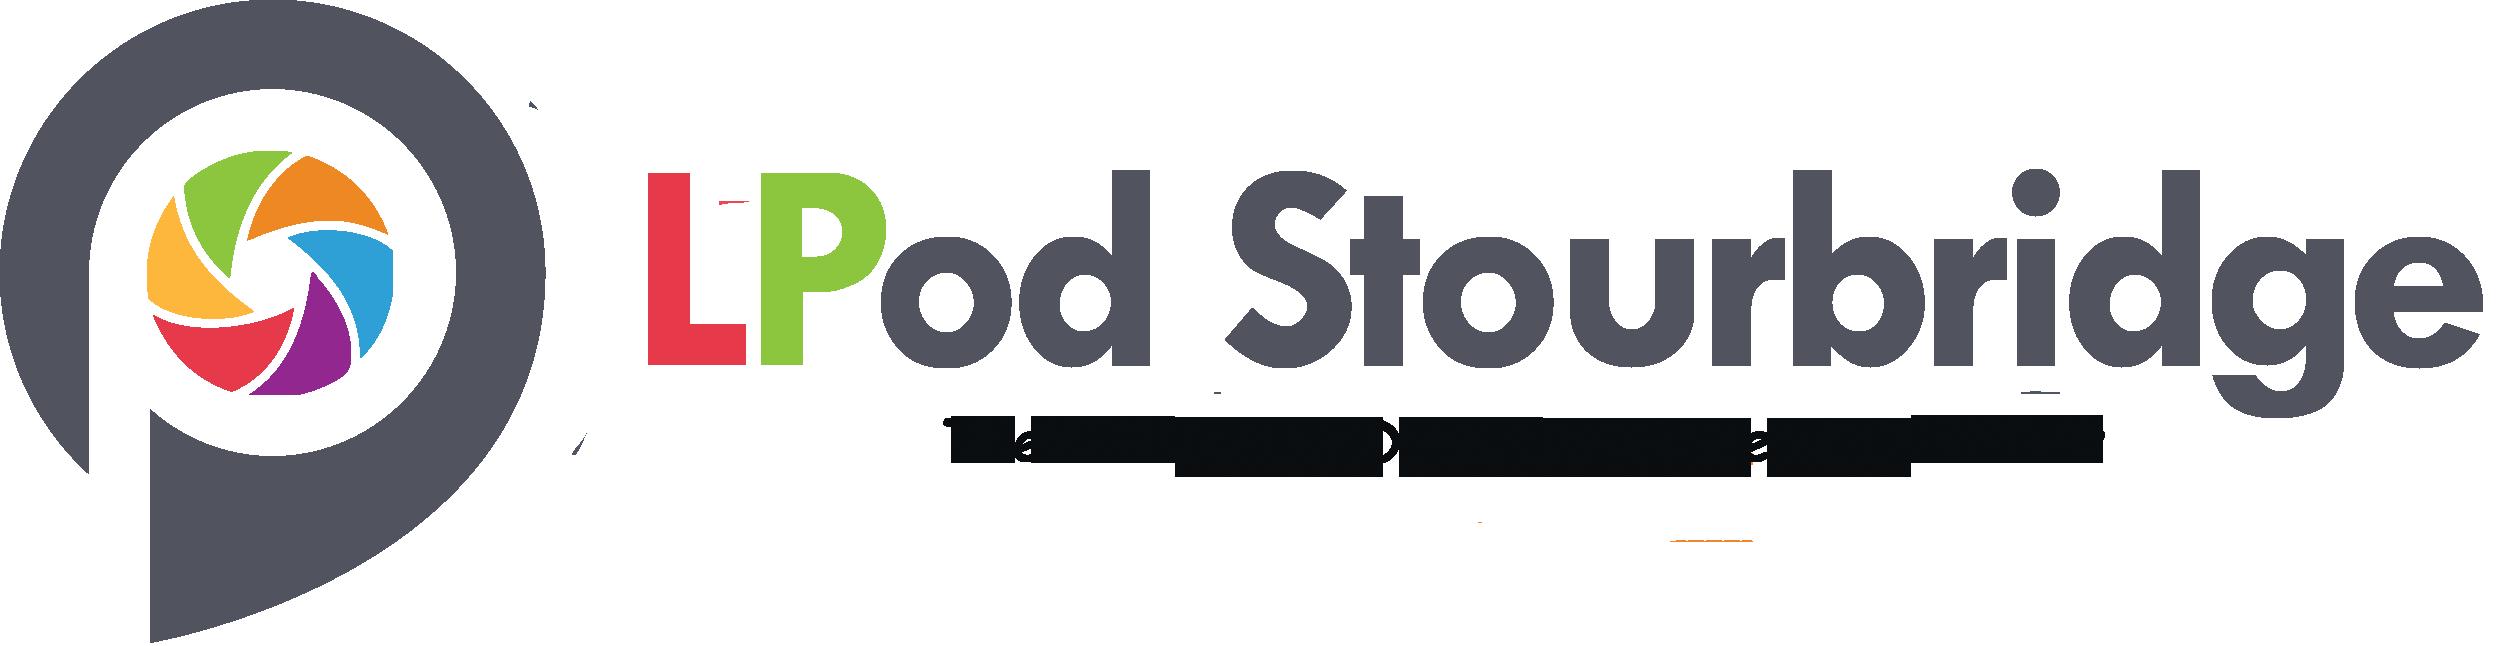 intensive driving courses Stourbridge